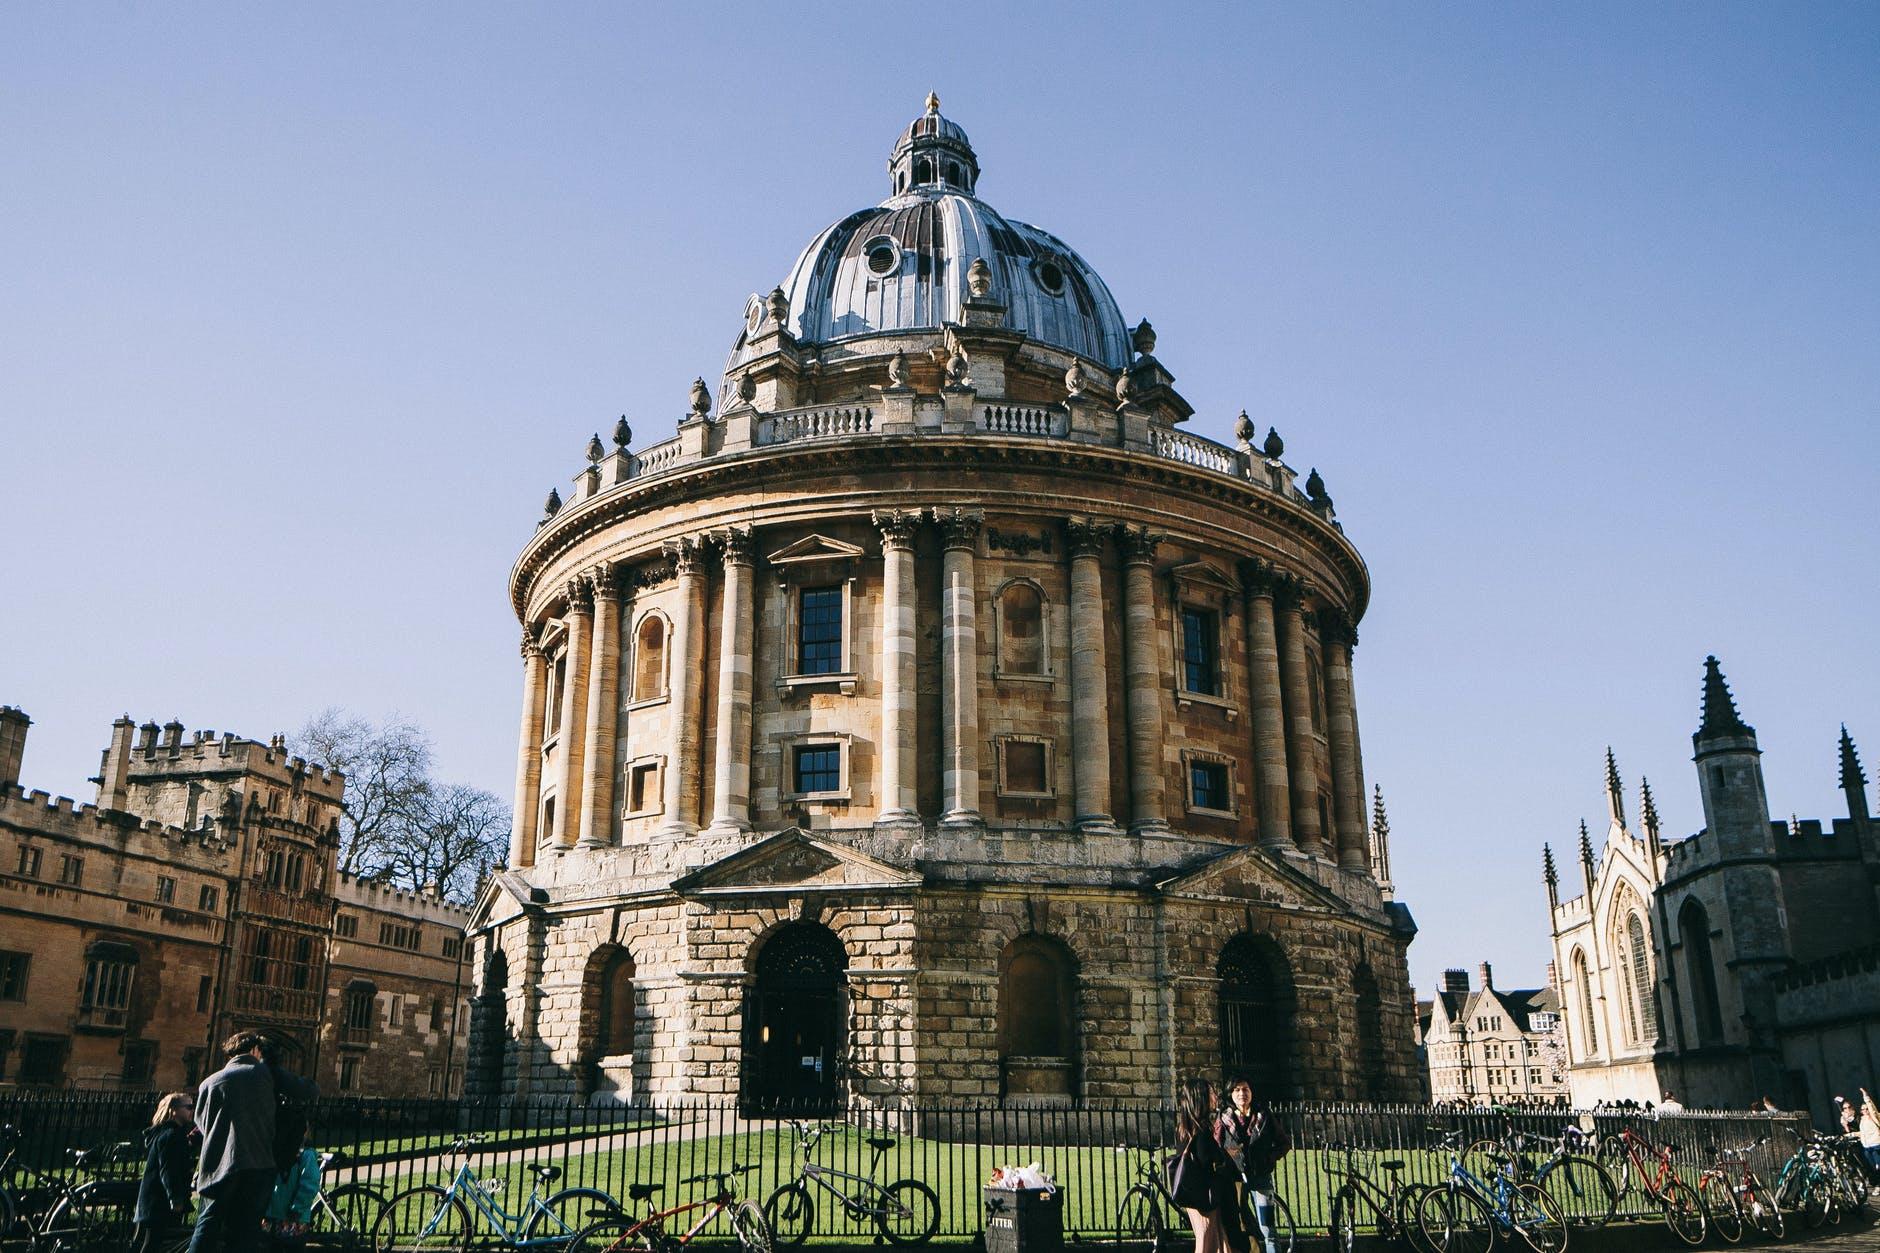 The University of Oxford's Radcliffe Camera building. Photo by Lina Kivaka on pexels.com